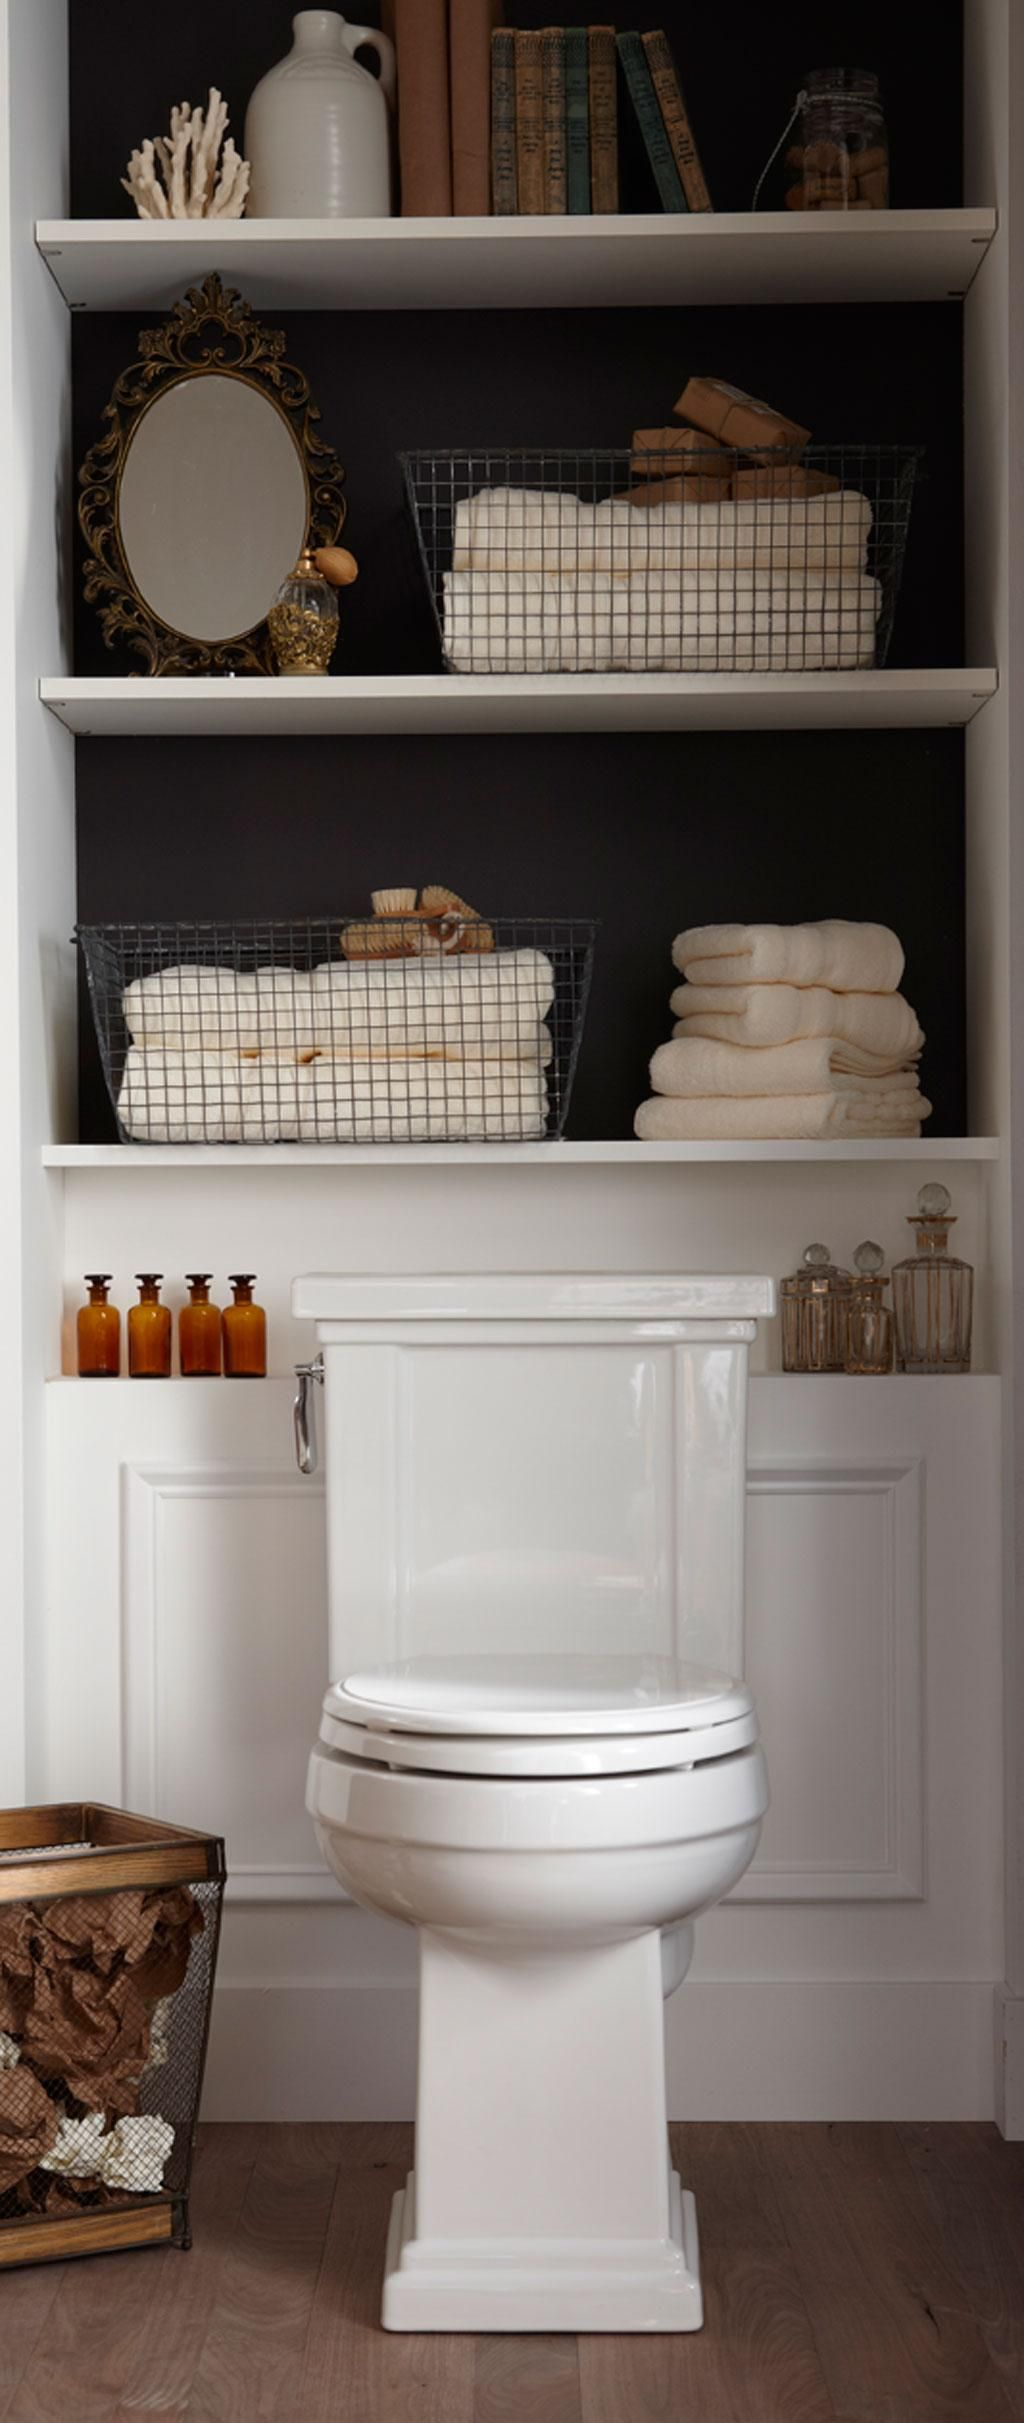 Open shelving in bathroom - Marvelous Open Shelving In Bathroom 4 Bathroom Behind Toilet Shelving